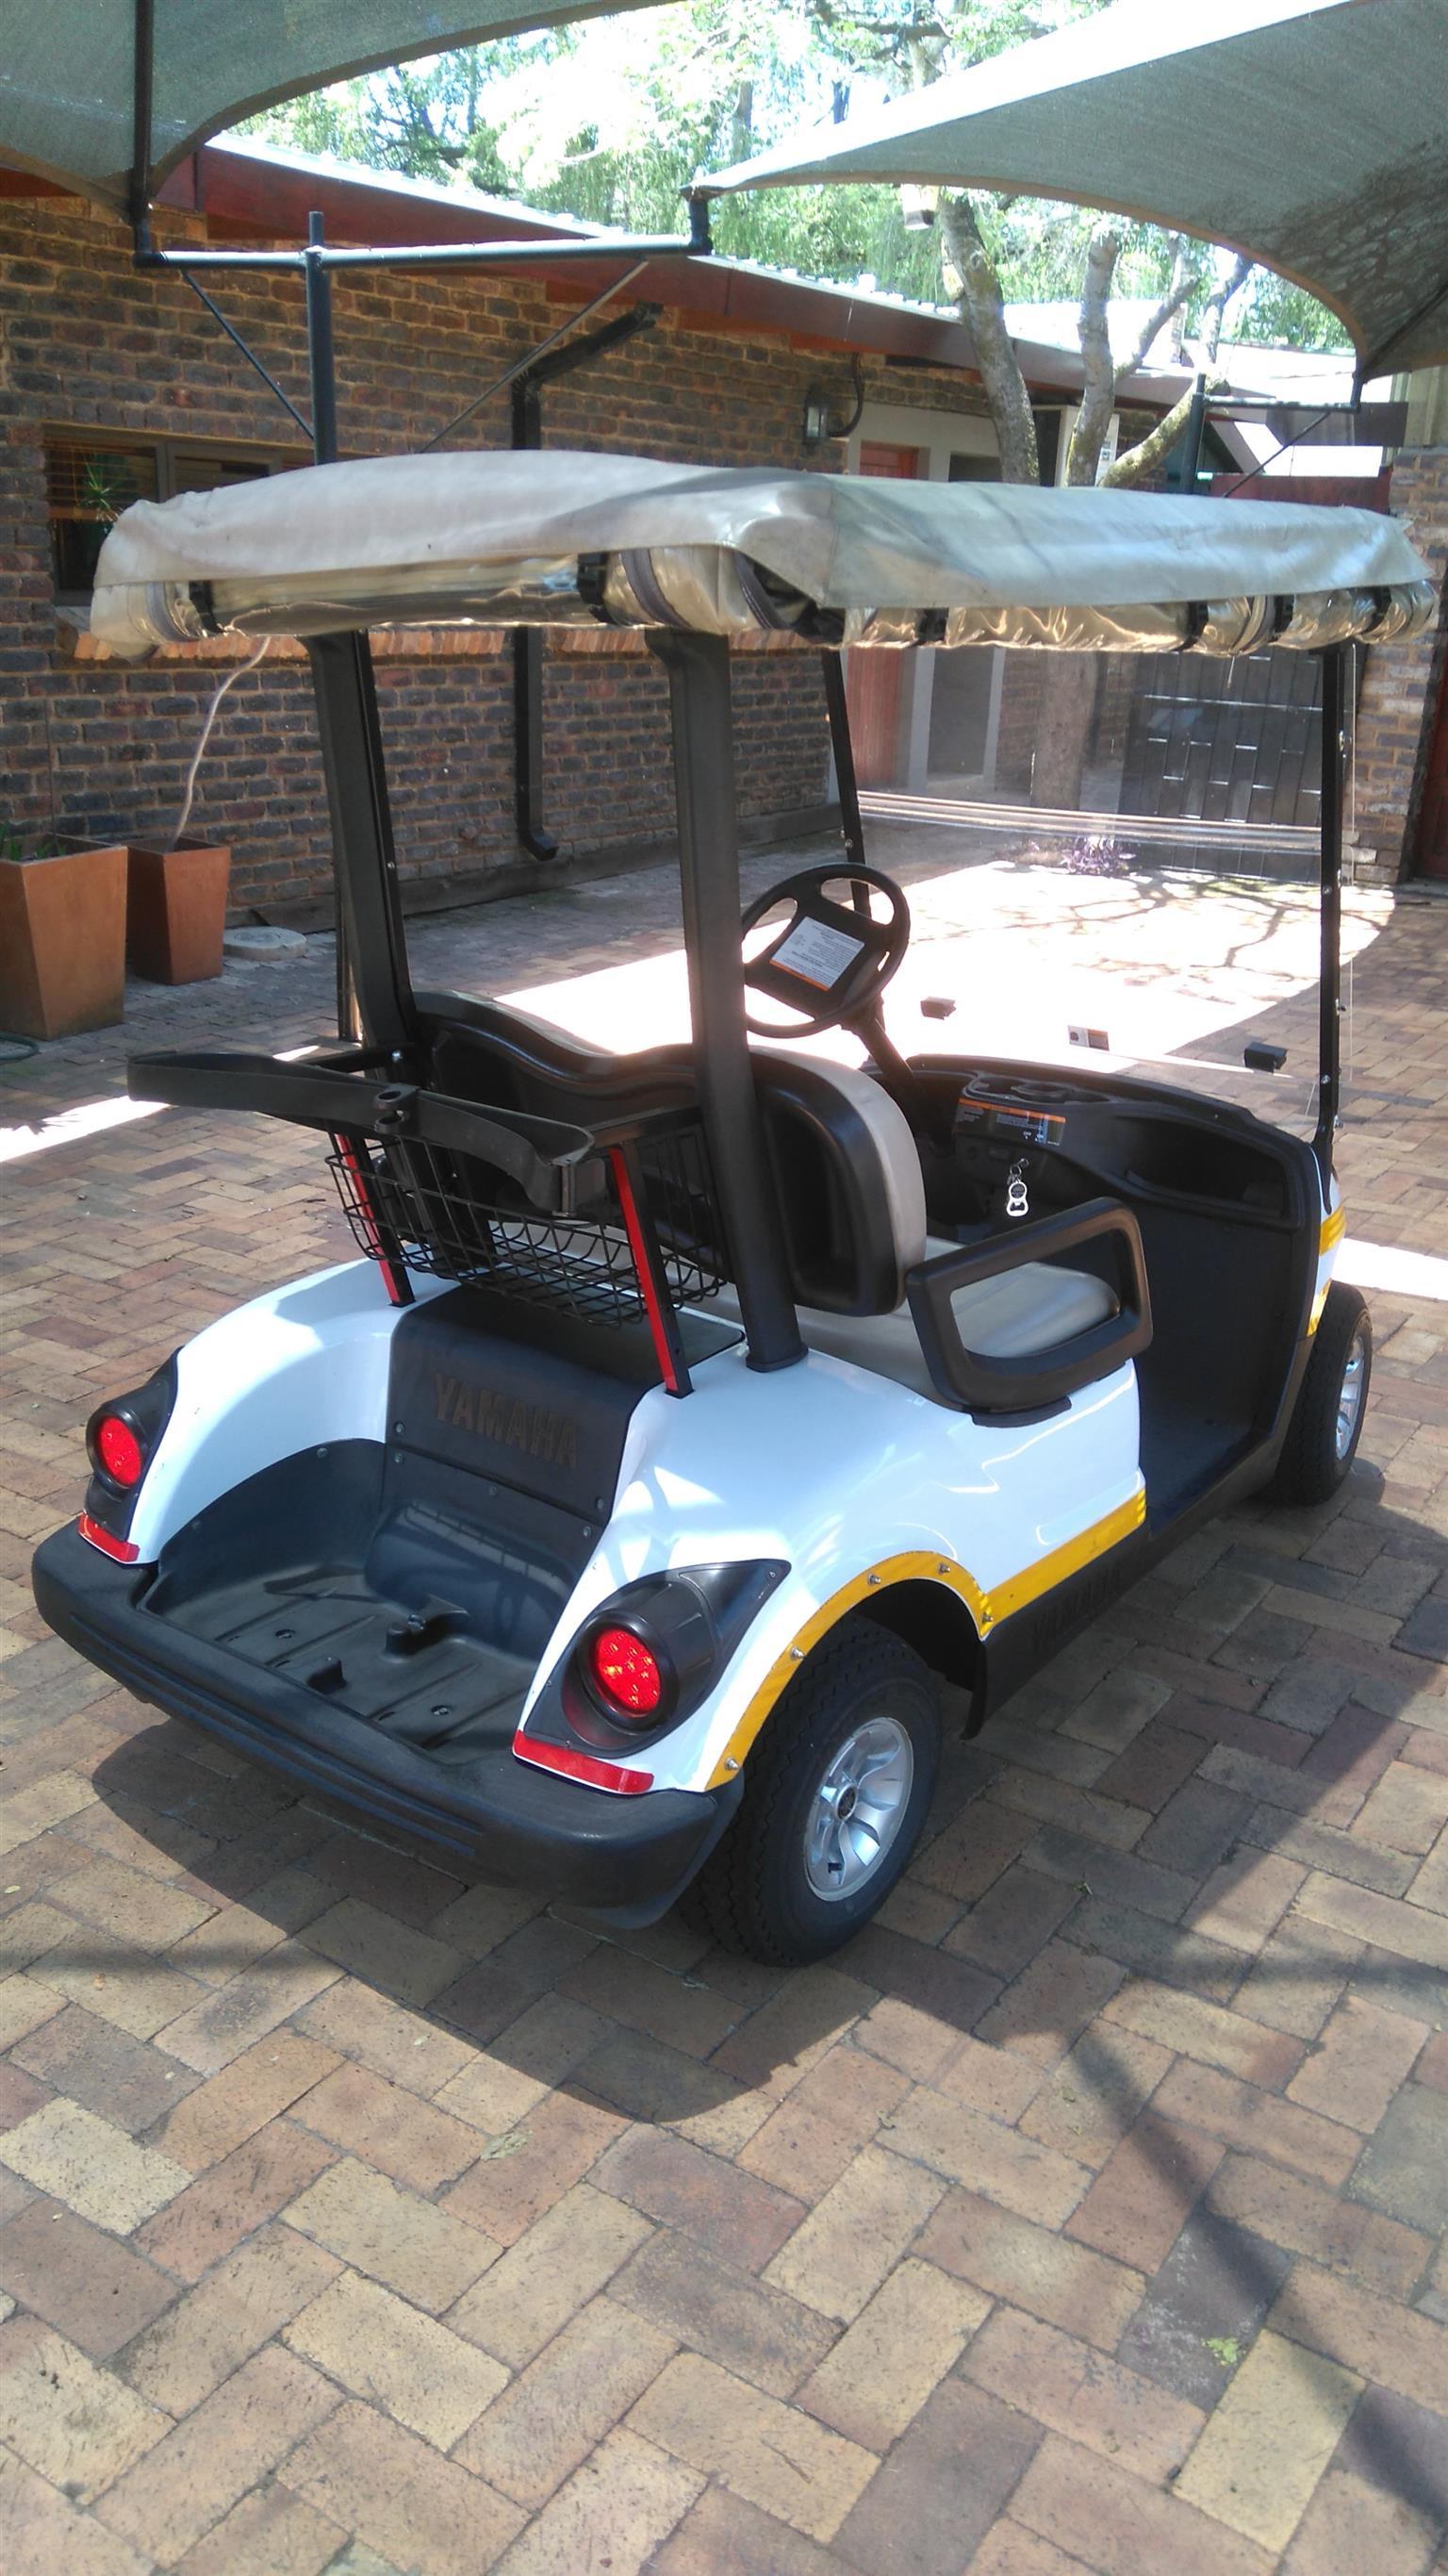 Yamaha petrol driven golf cart for sale